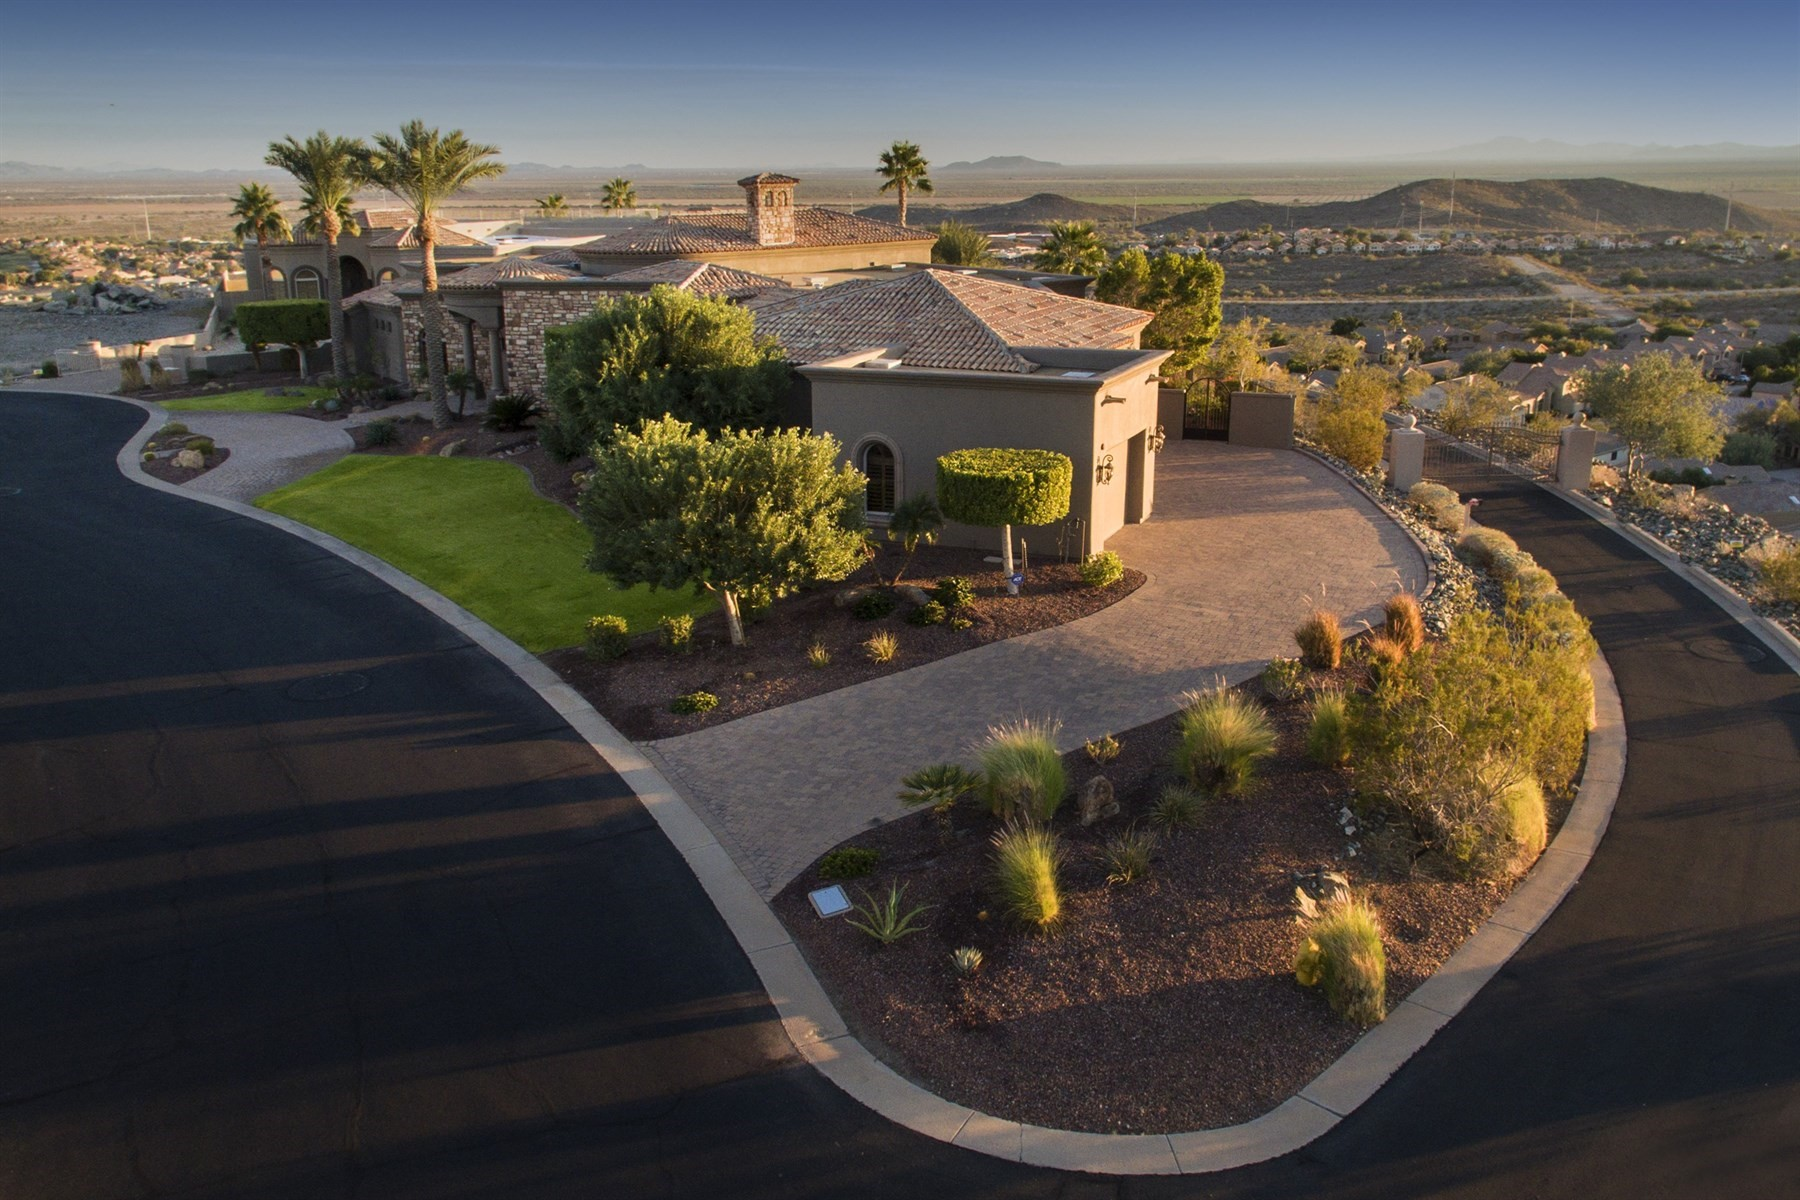 Moradia para Venda às Eagle Ridge Estates 15808 S 7th St Phoenix, Arizona, 85048 Estados Unidos